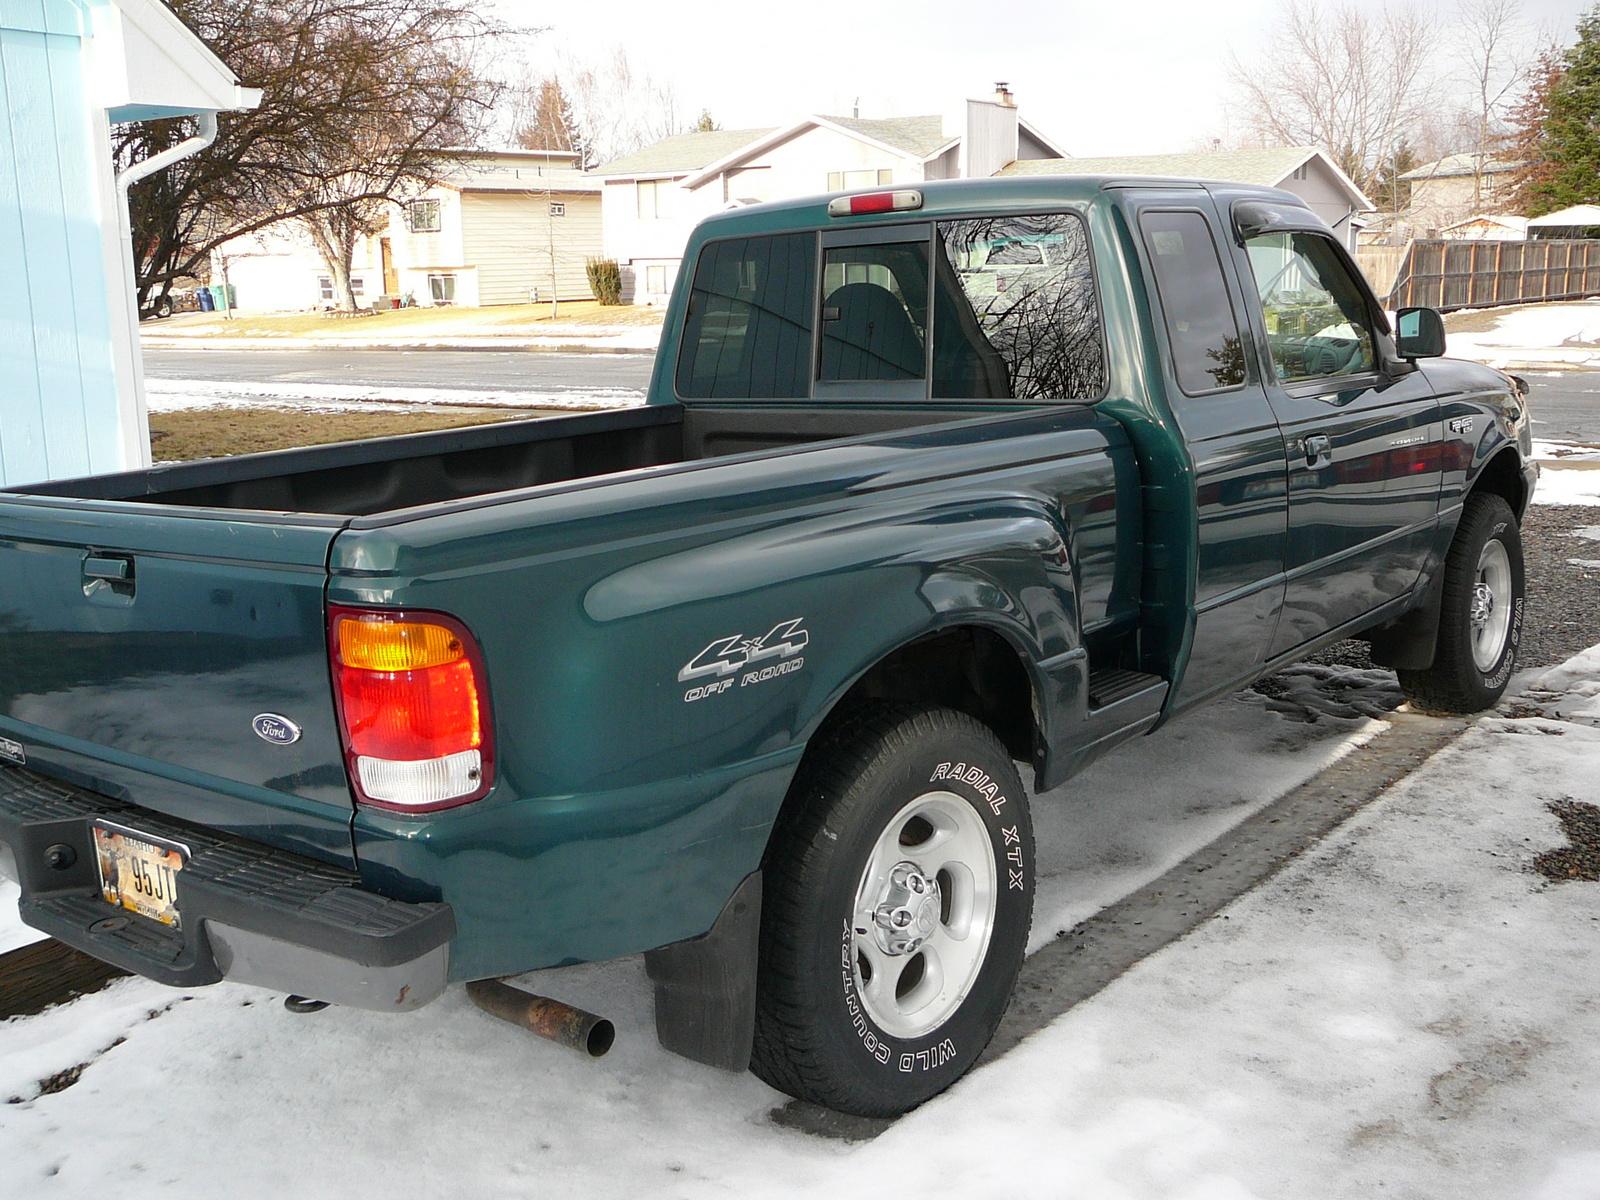 2013 Ford Escape Value >> 1998 Ford ranger extended cab stepside